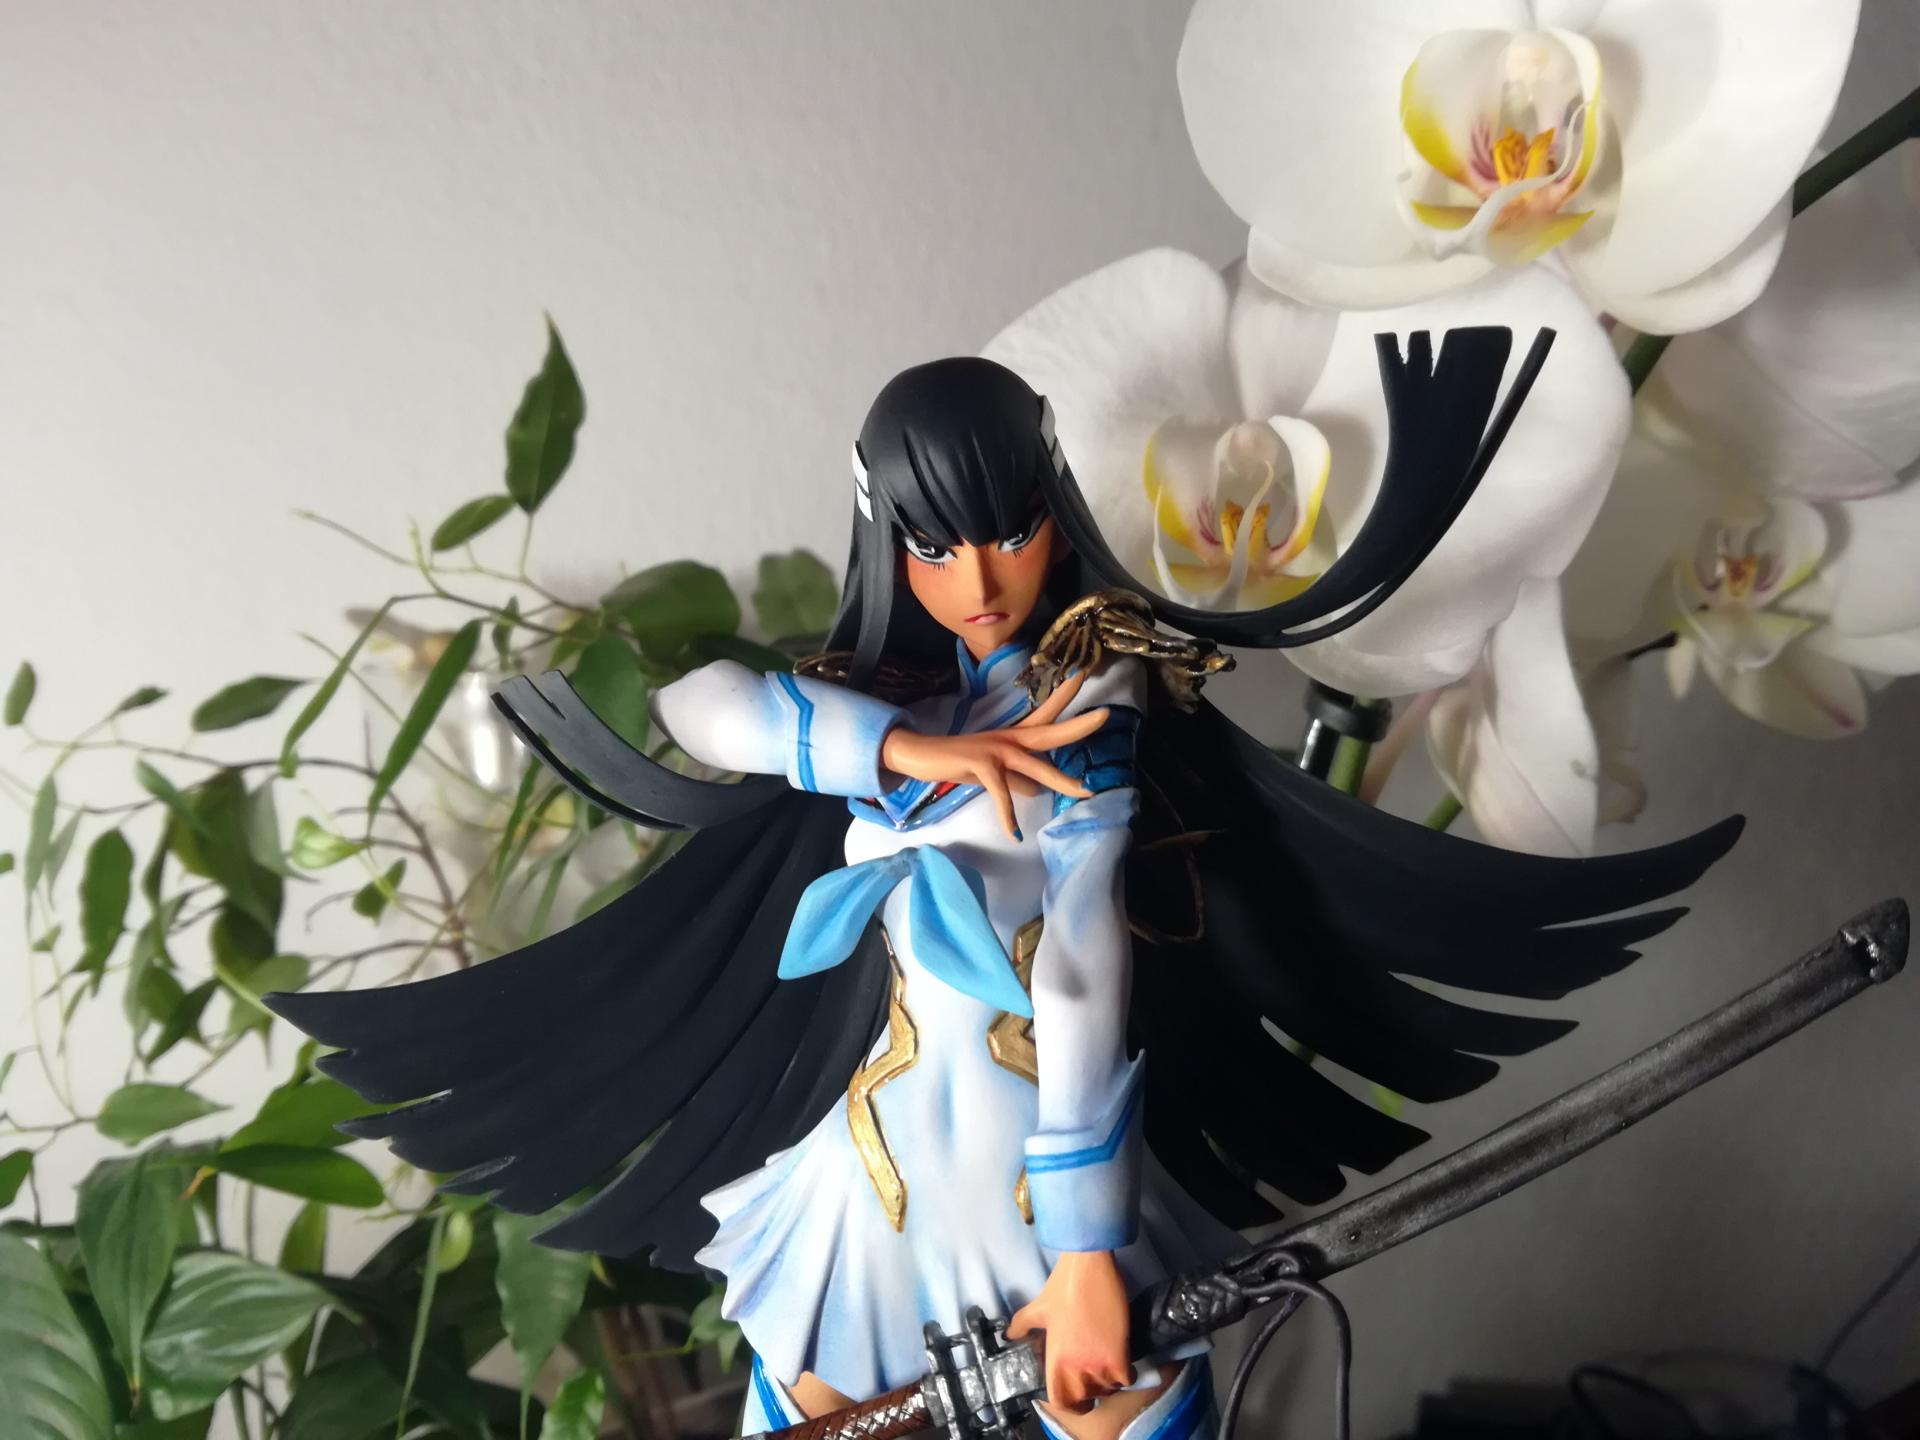 Kiryuin Satsuki